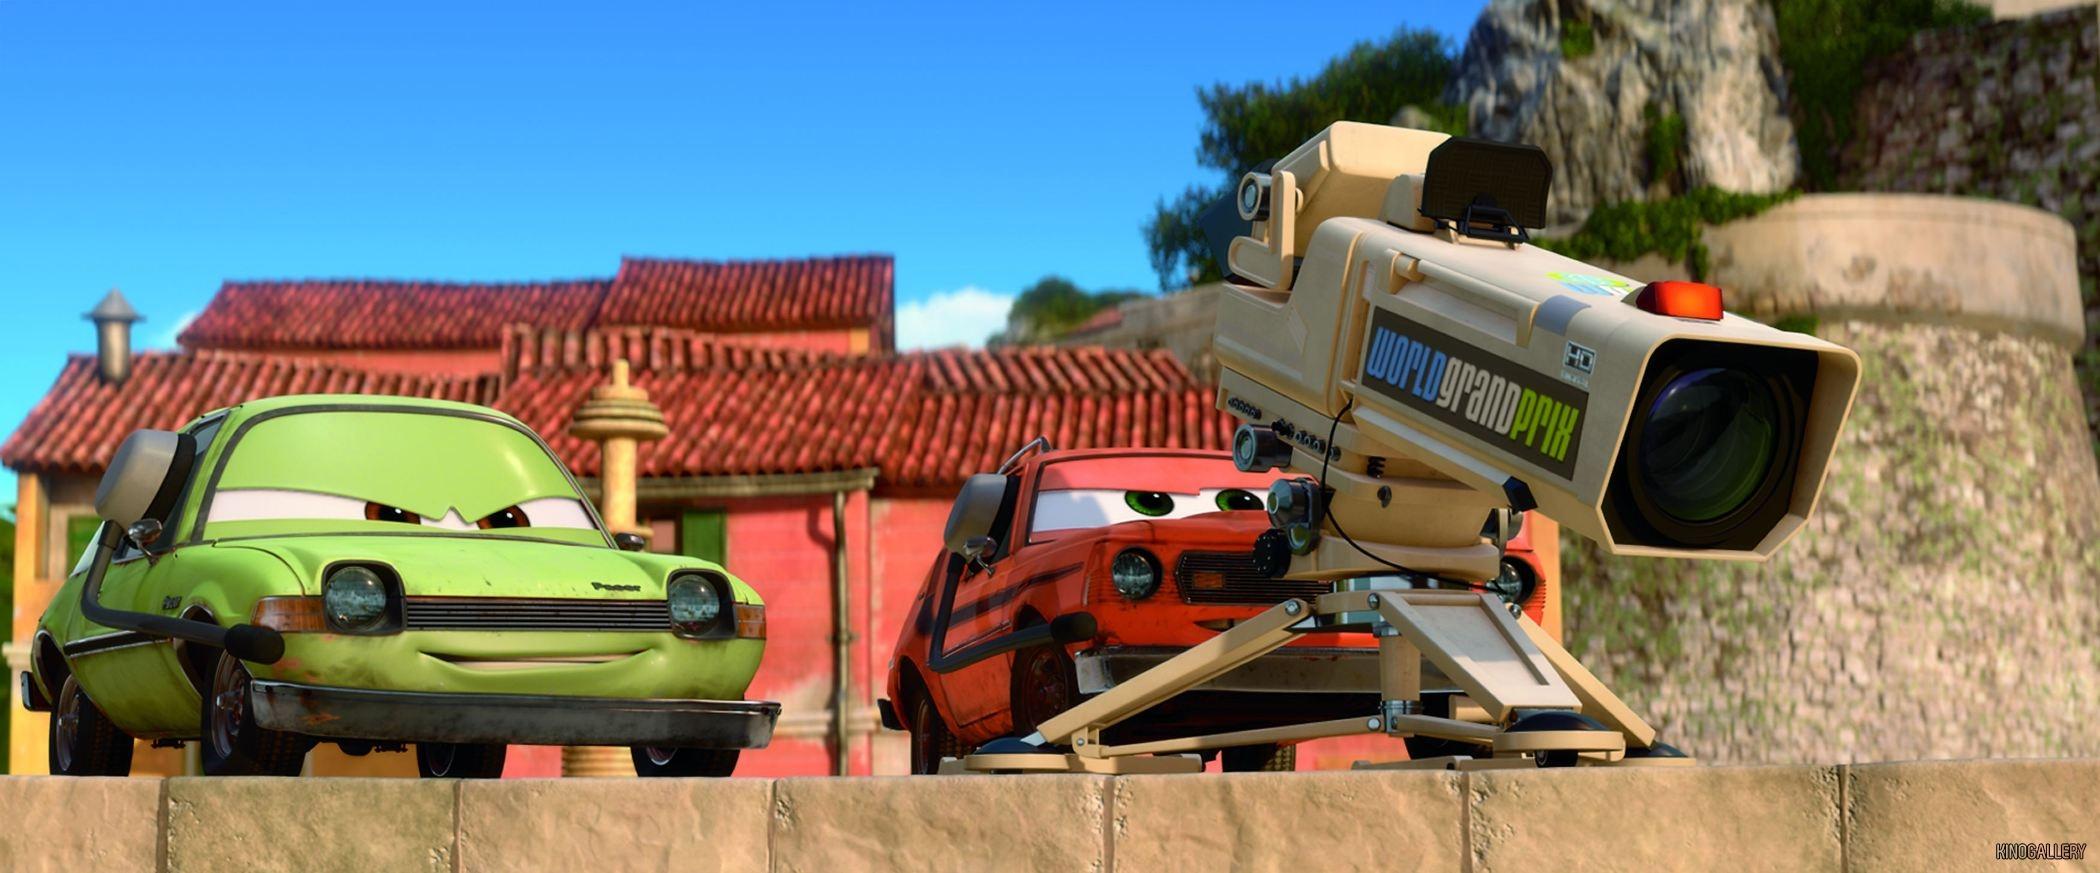 Disney pixar cars 2 cars 2 pics